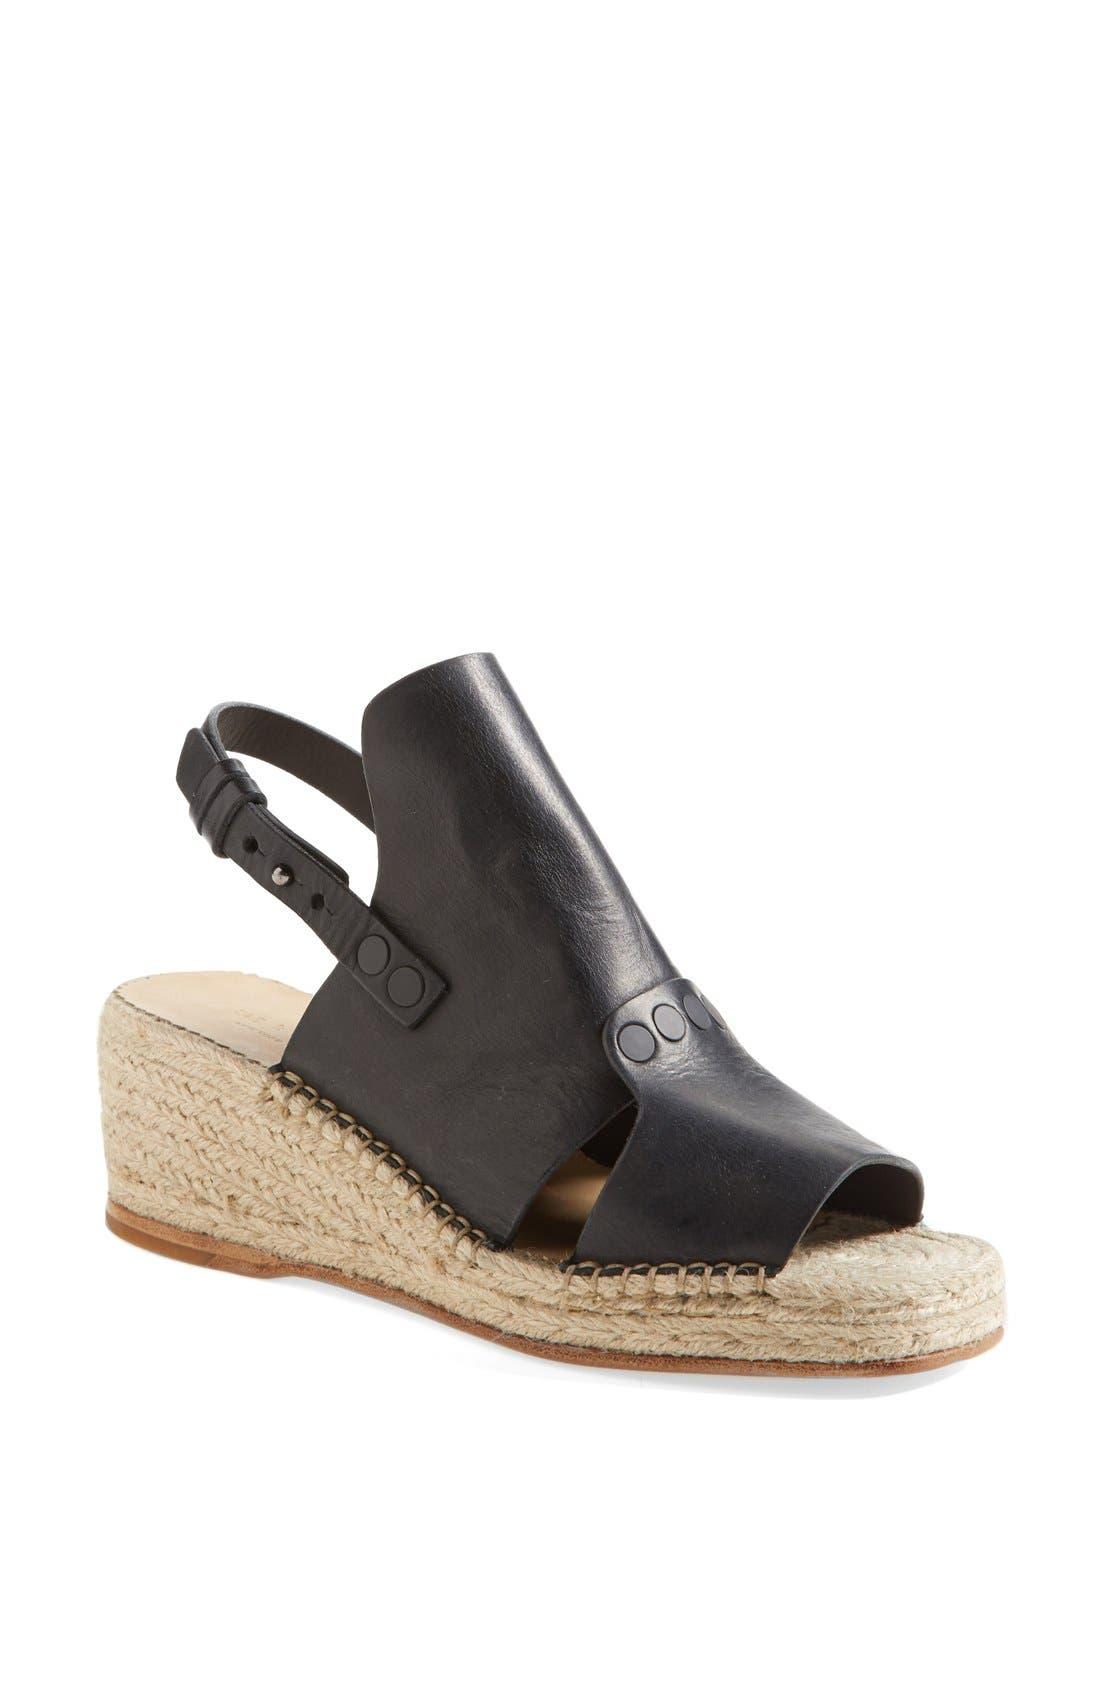 Main Image - rag & bone 'Sayre II' Espadrille Wedge Sandal